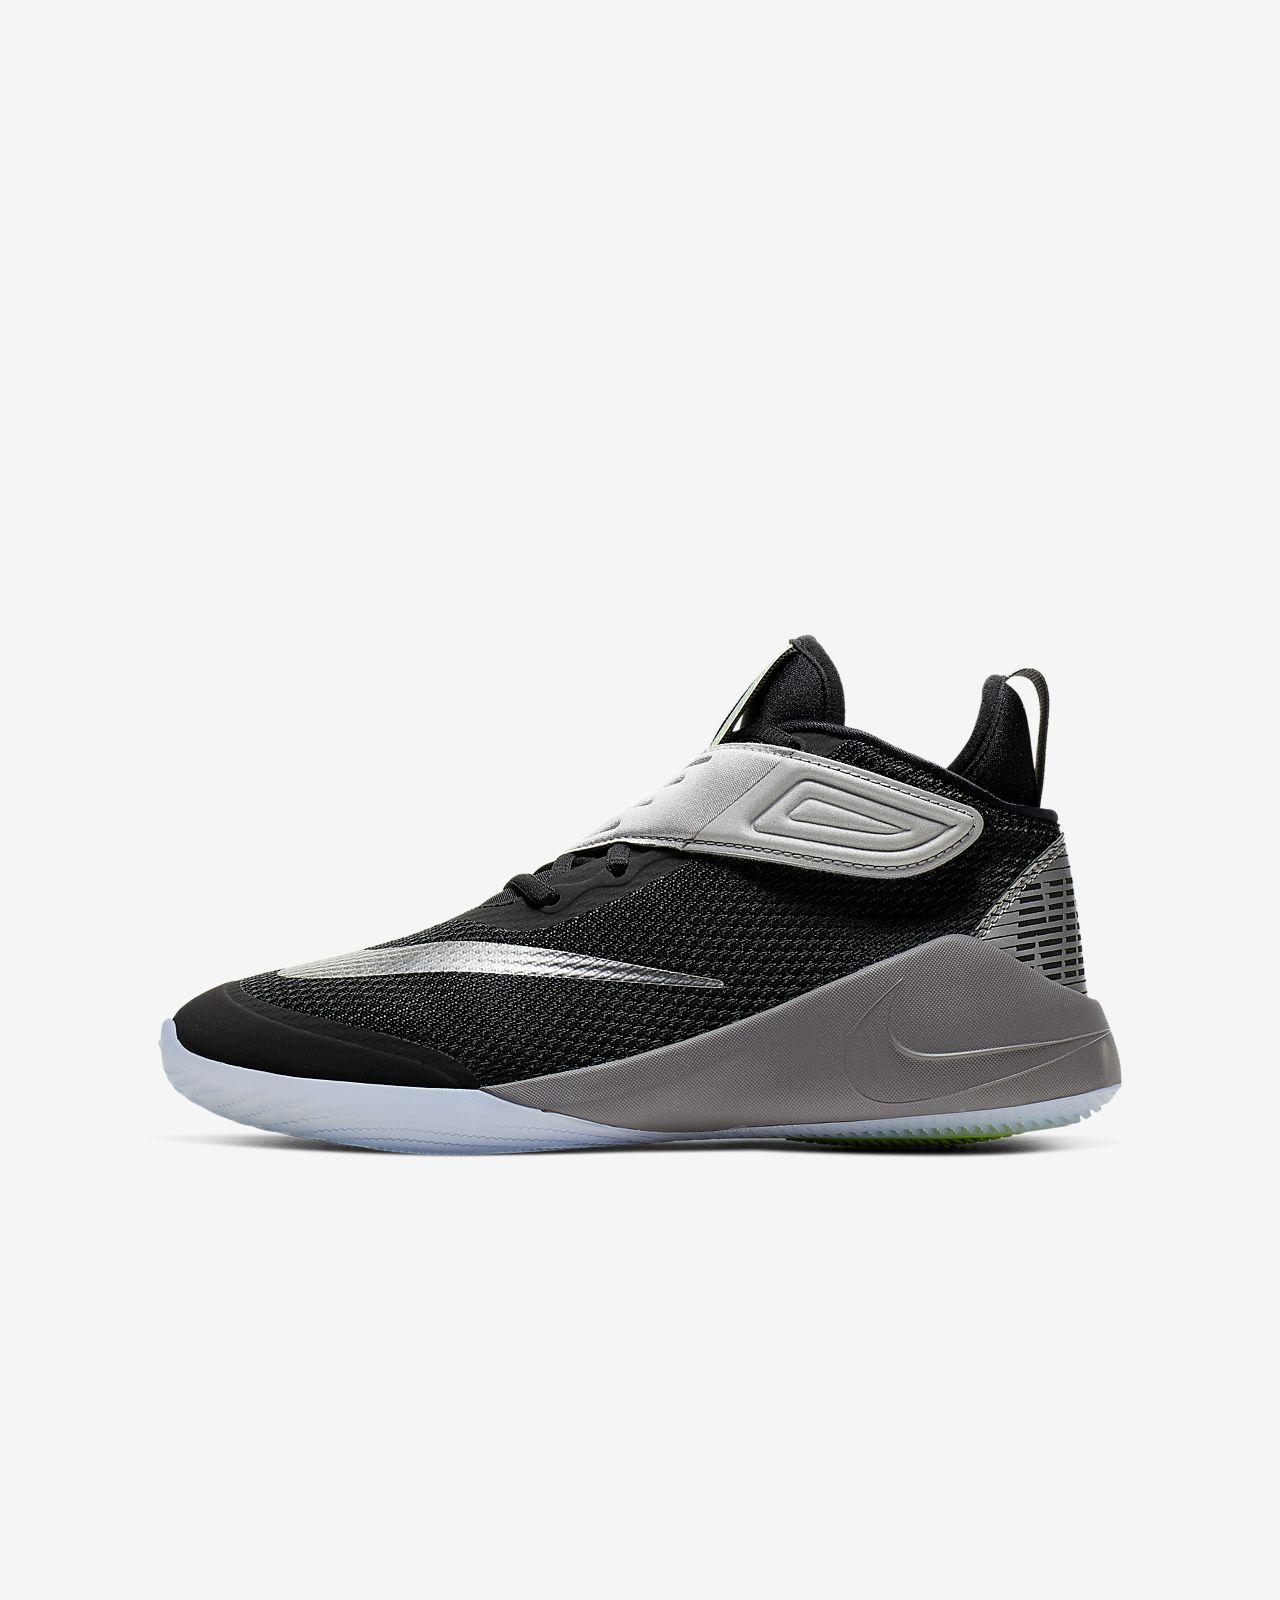 Nike Future Flight 2 LittleBig Kids' Basketball Shoe